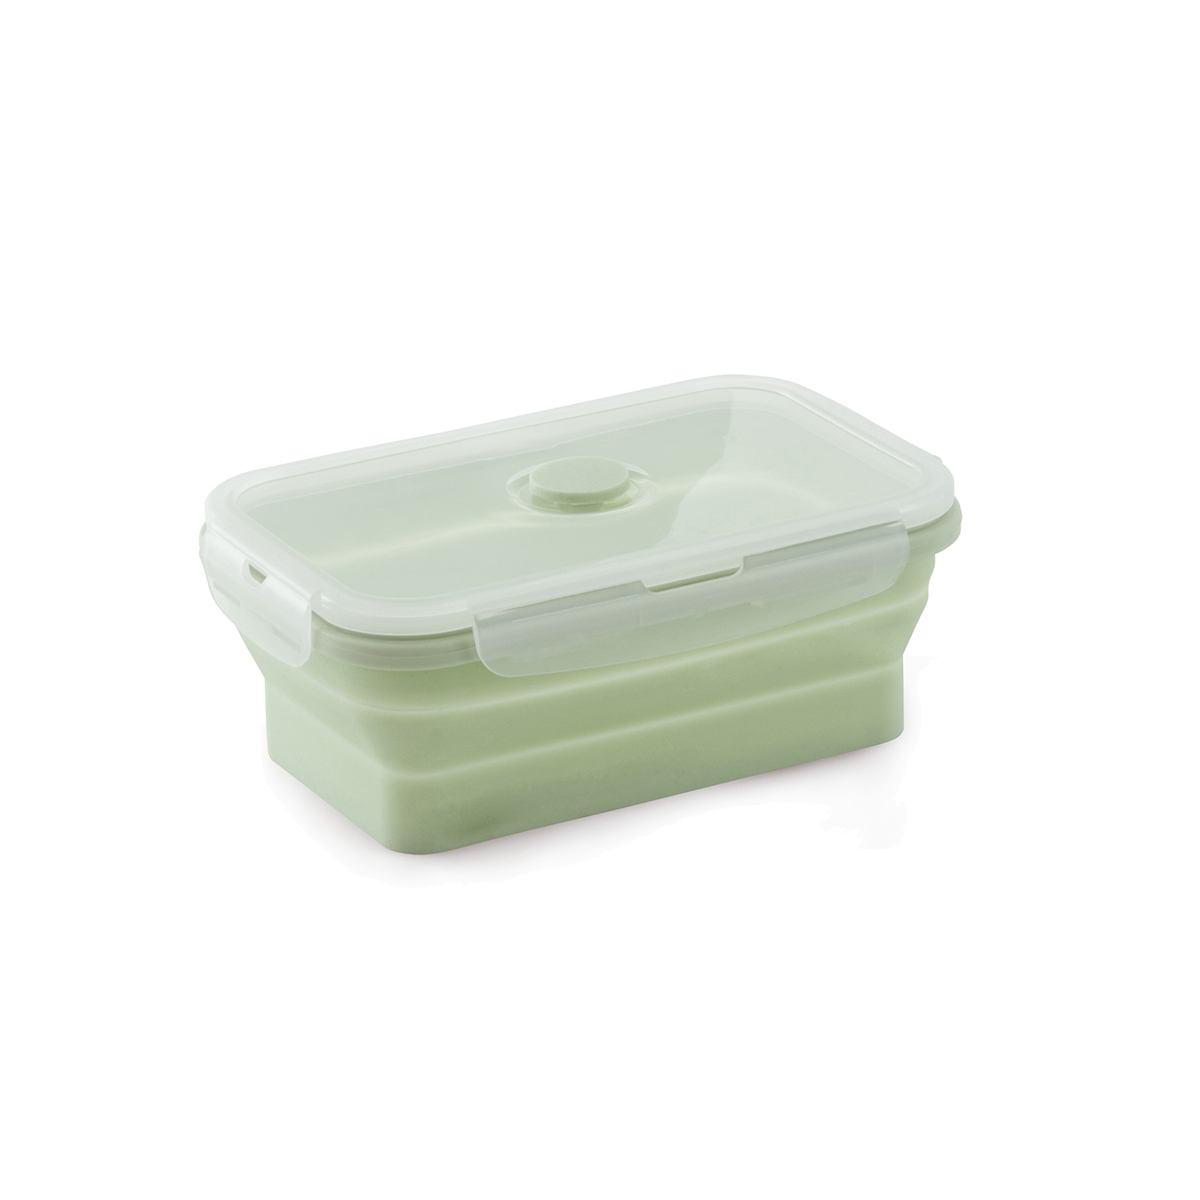 Marmita porta alimentos silicone retrátil 450ml verde Mimo Style